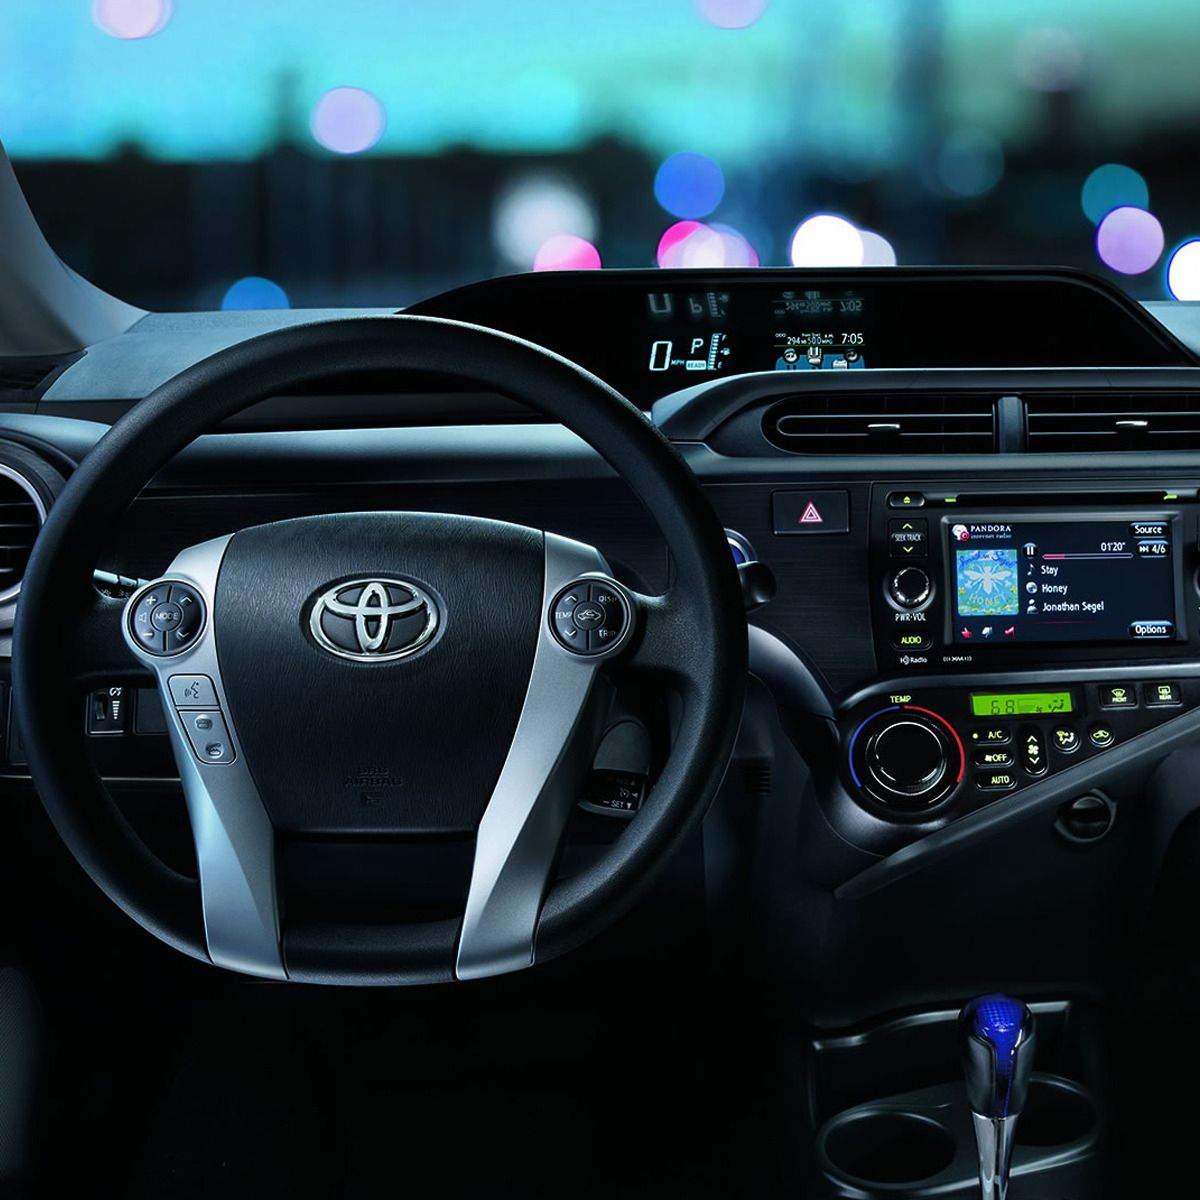 Toyota Prius C Toyota Prius Toyota Cars